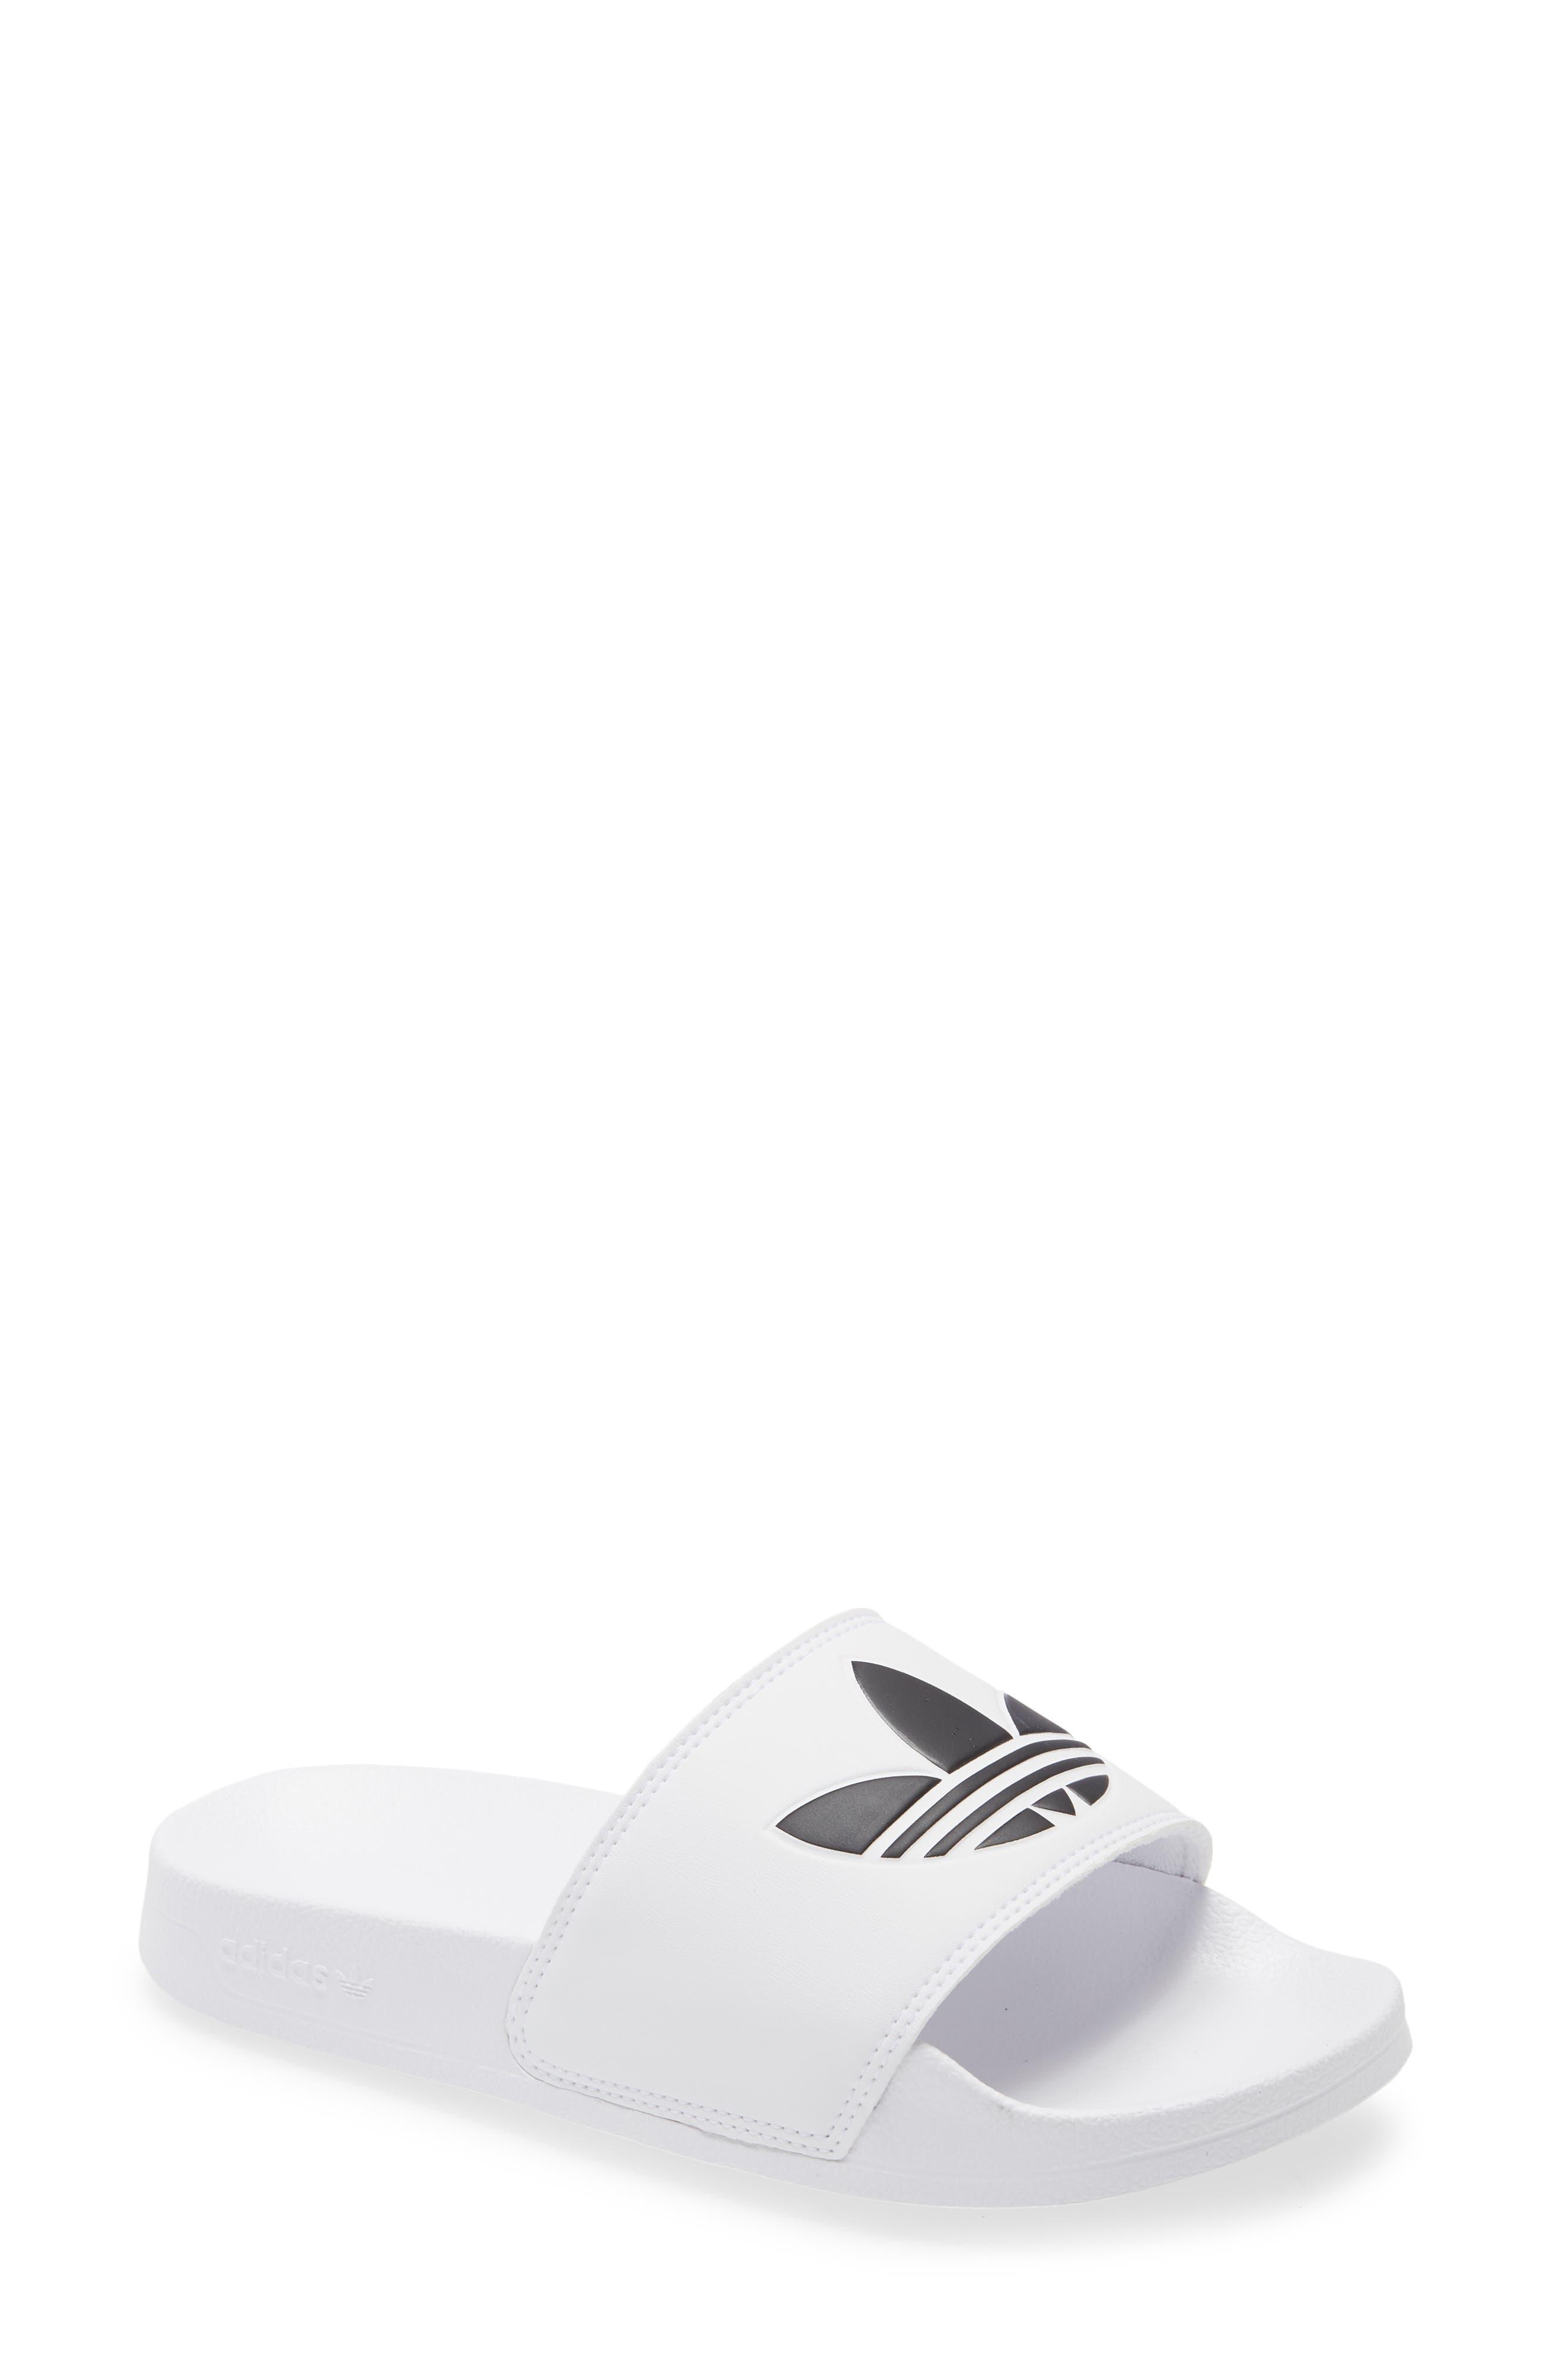 adidas Kid's Adidas Adilette Lite Sport Slide, Size 7 M - White